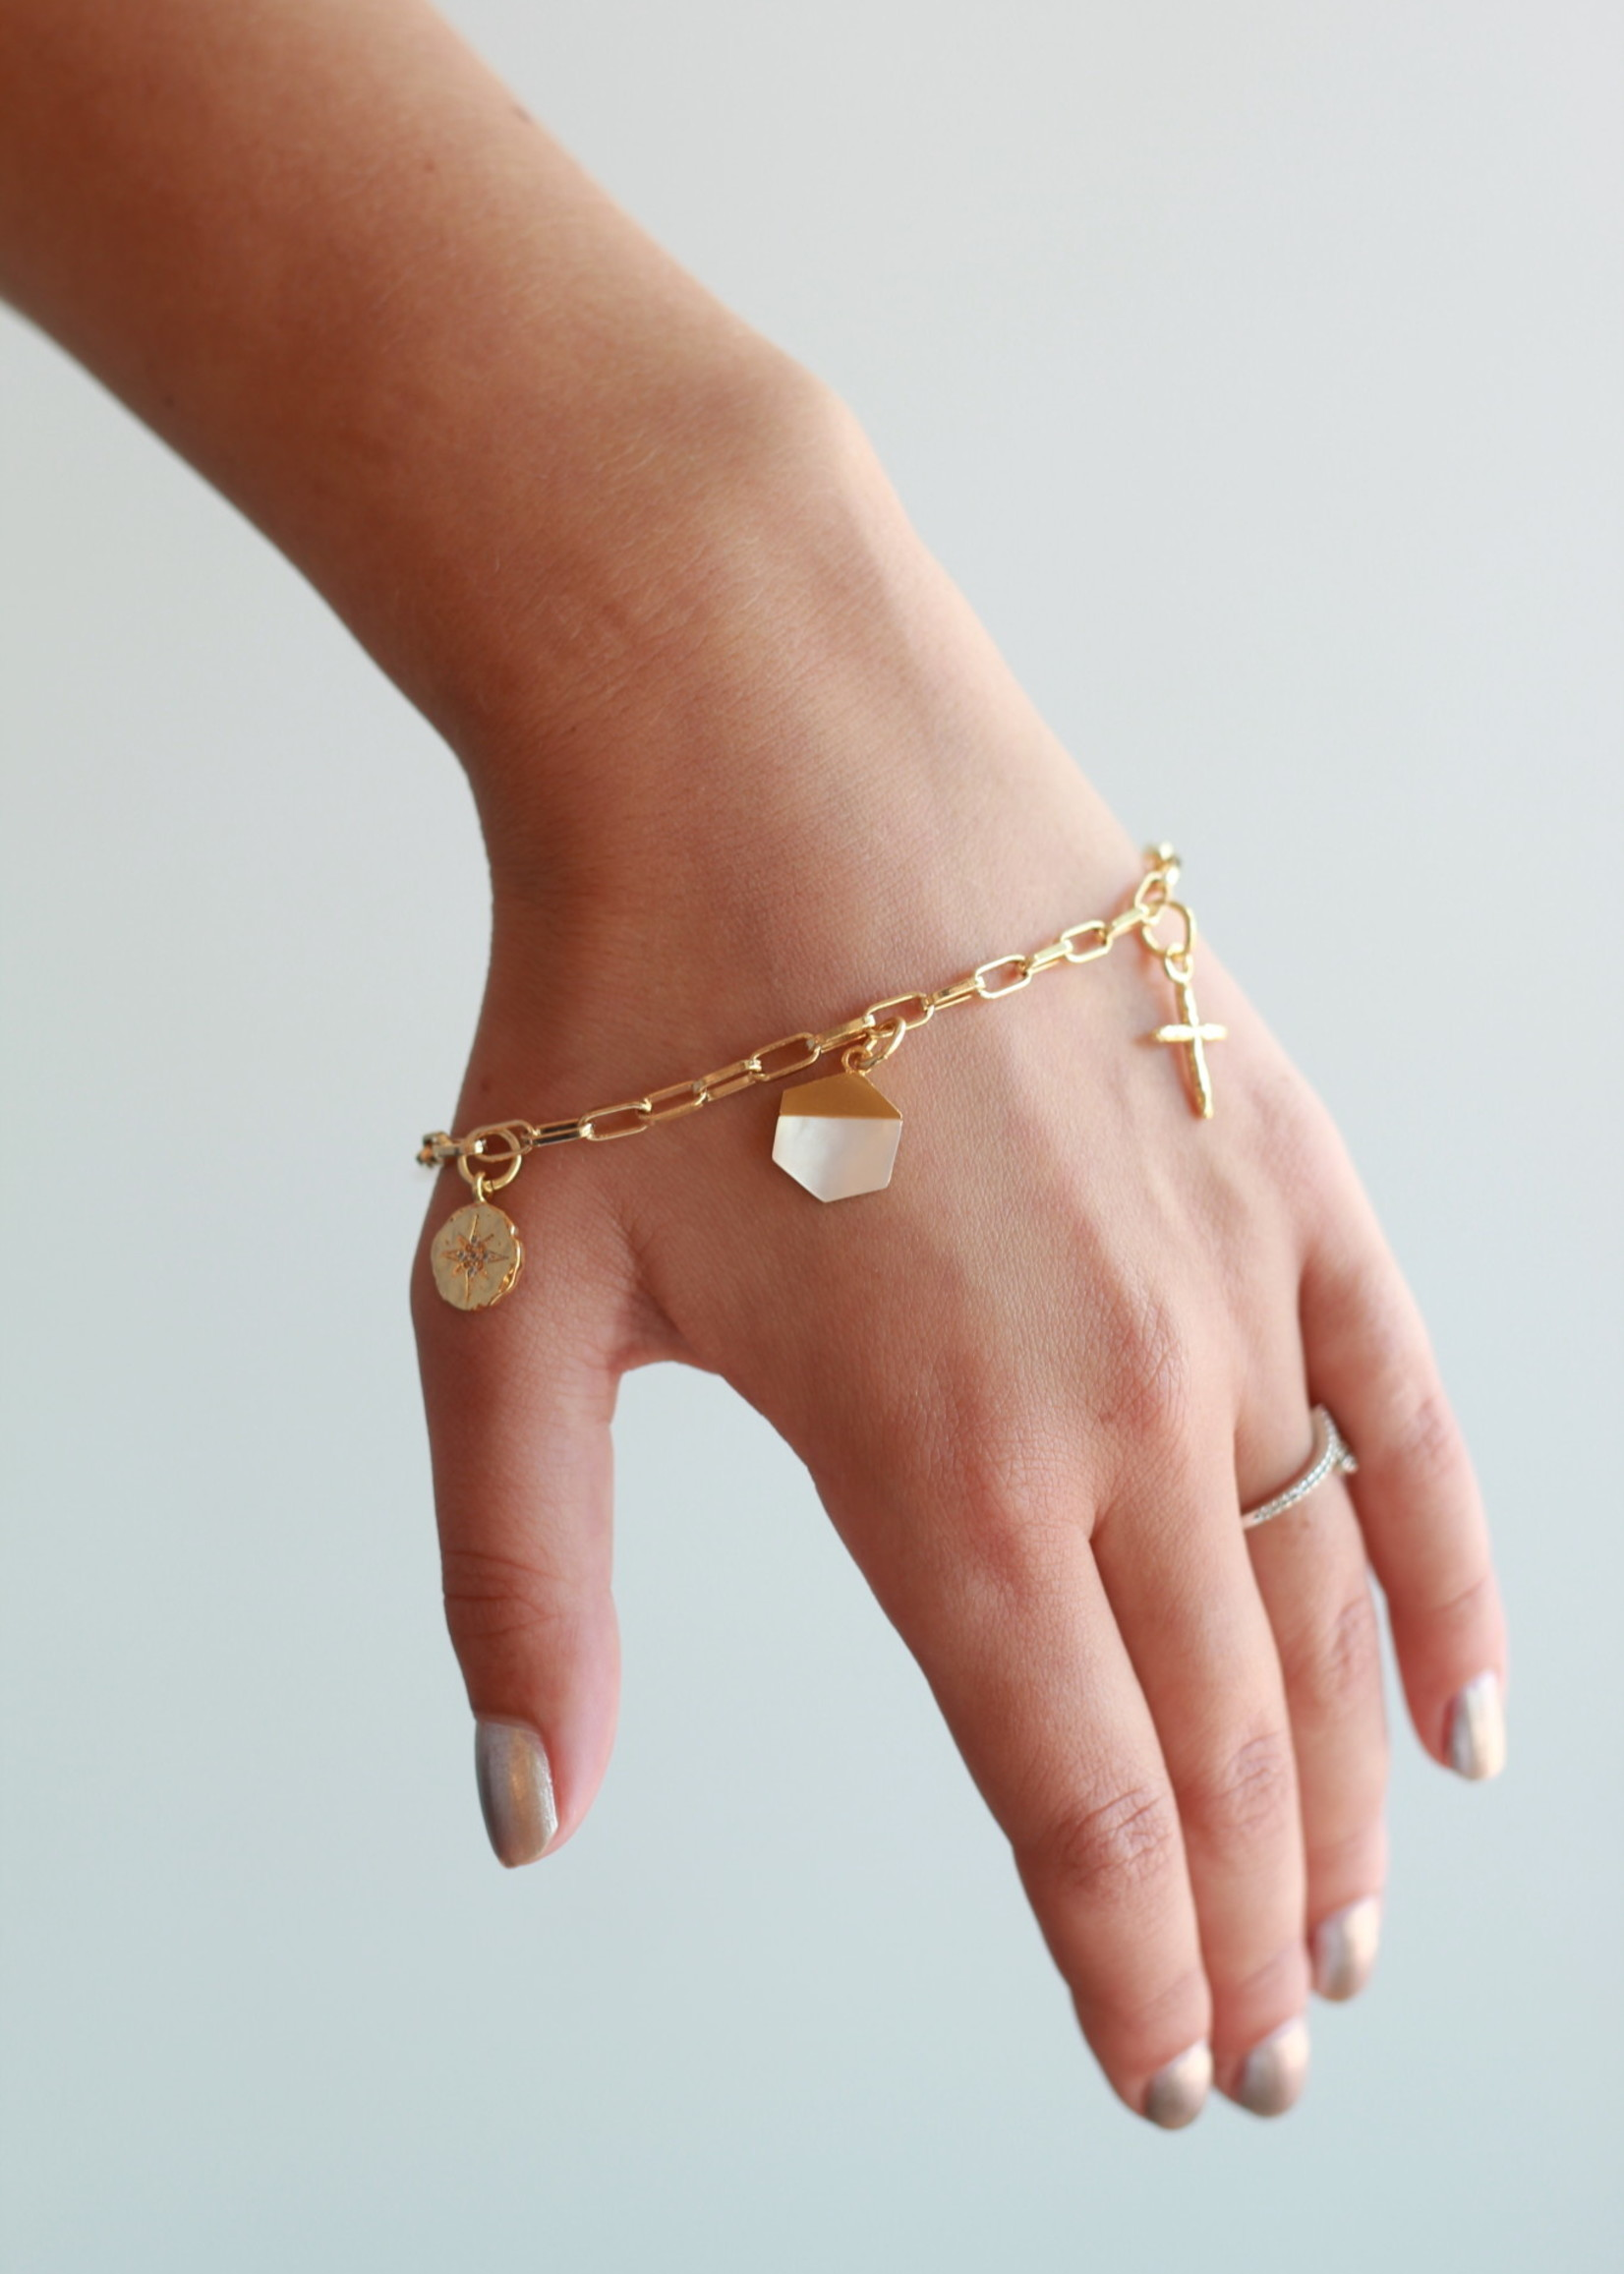 Allison Conway AC Golden Spirit Charm Bracelet